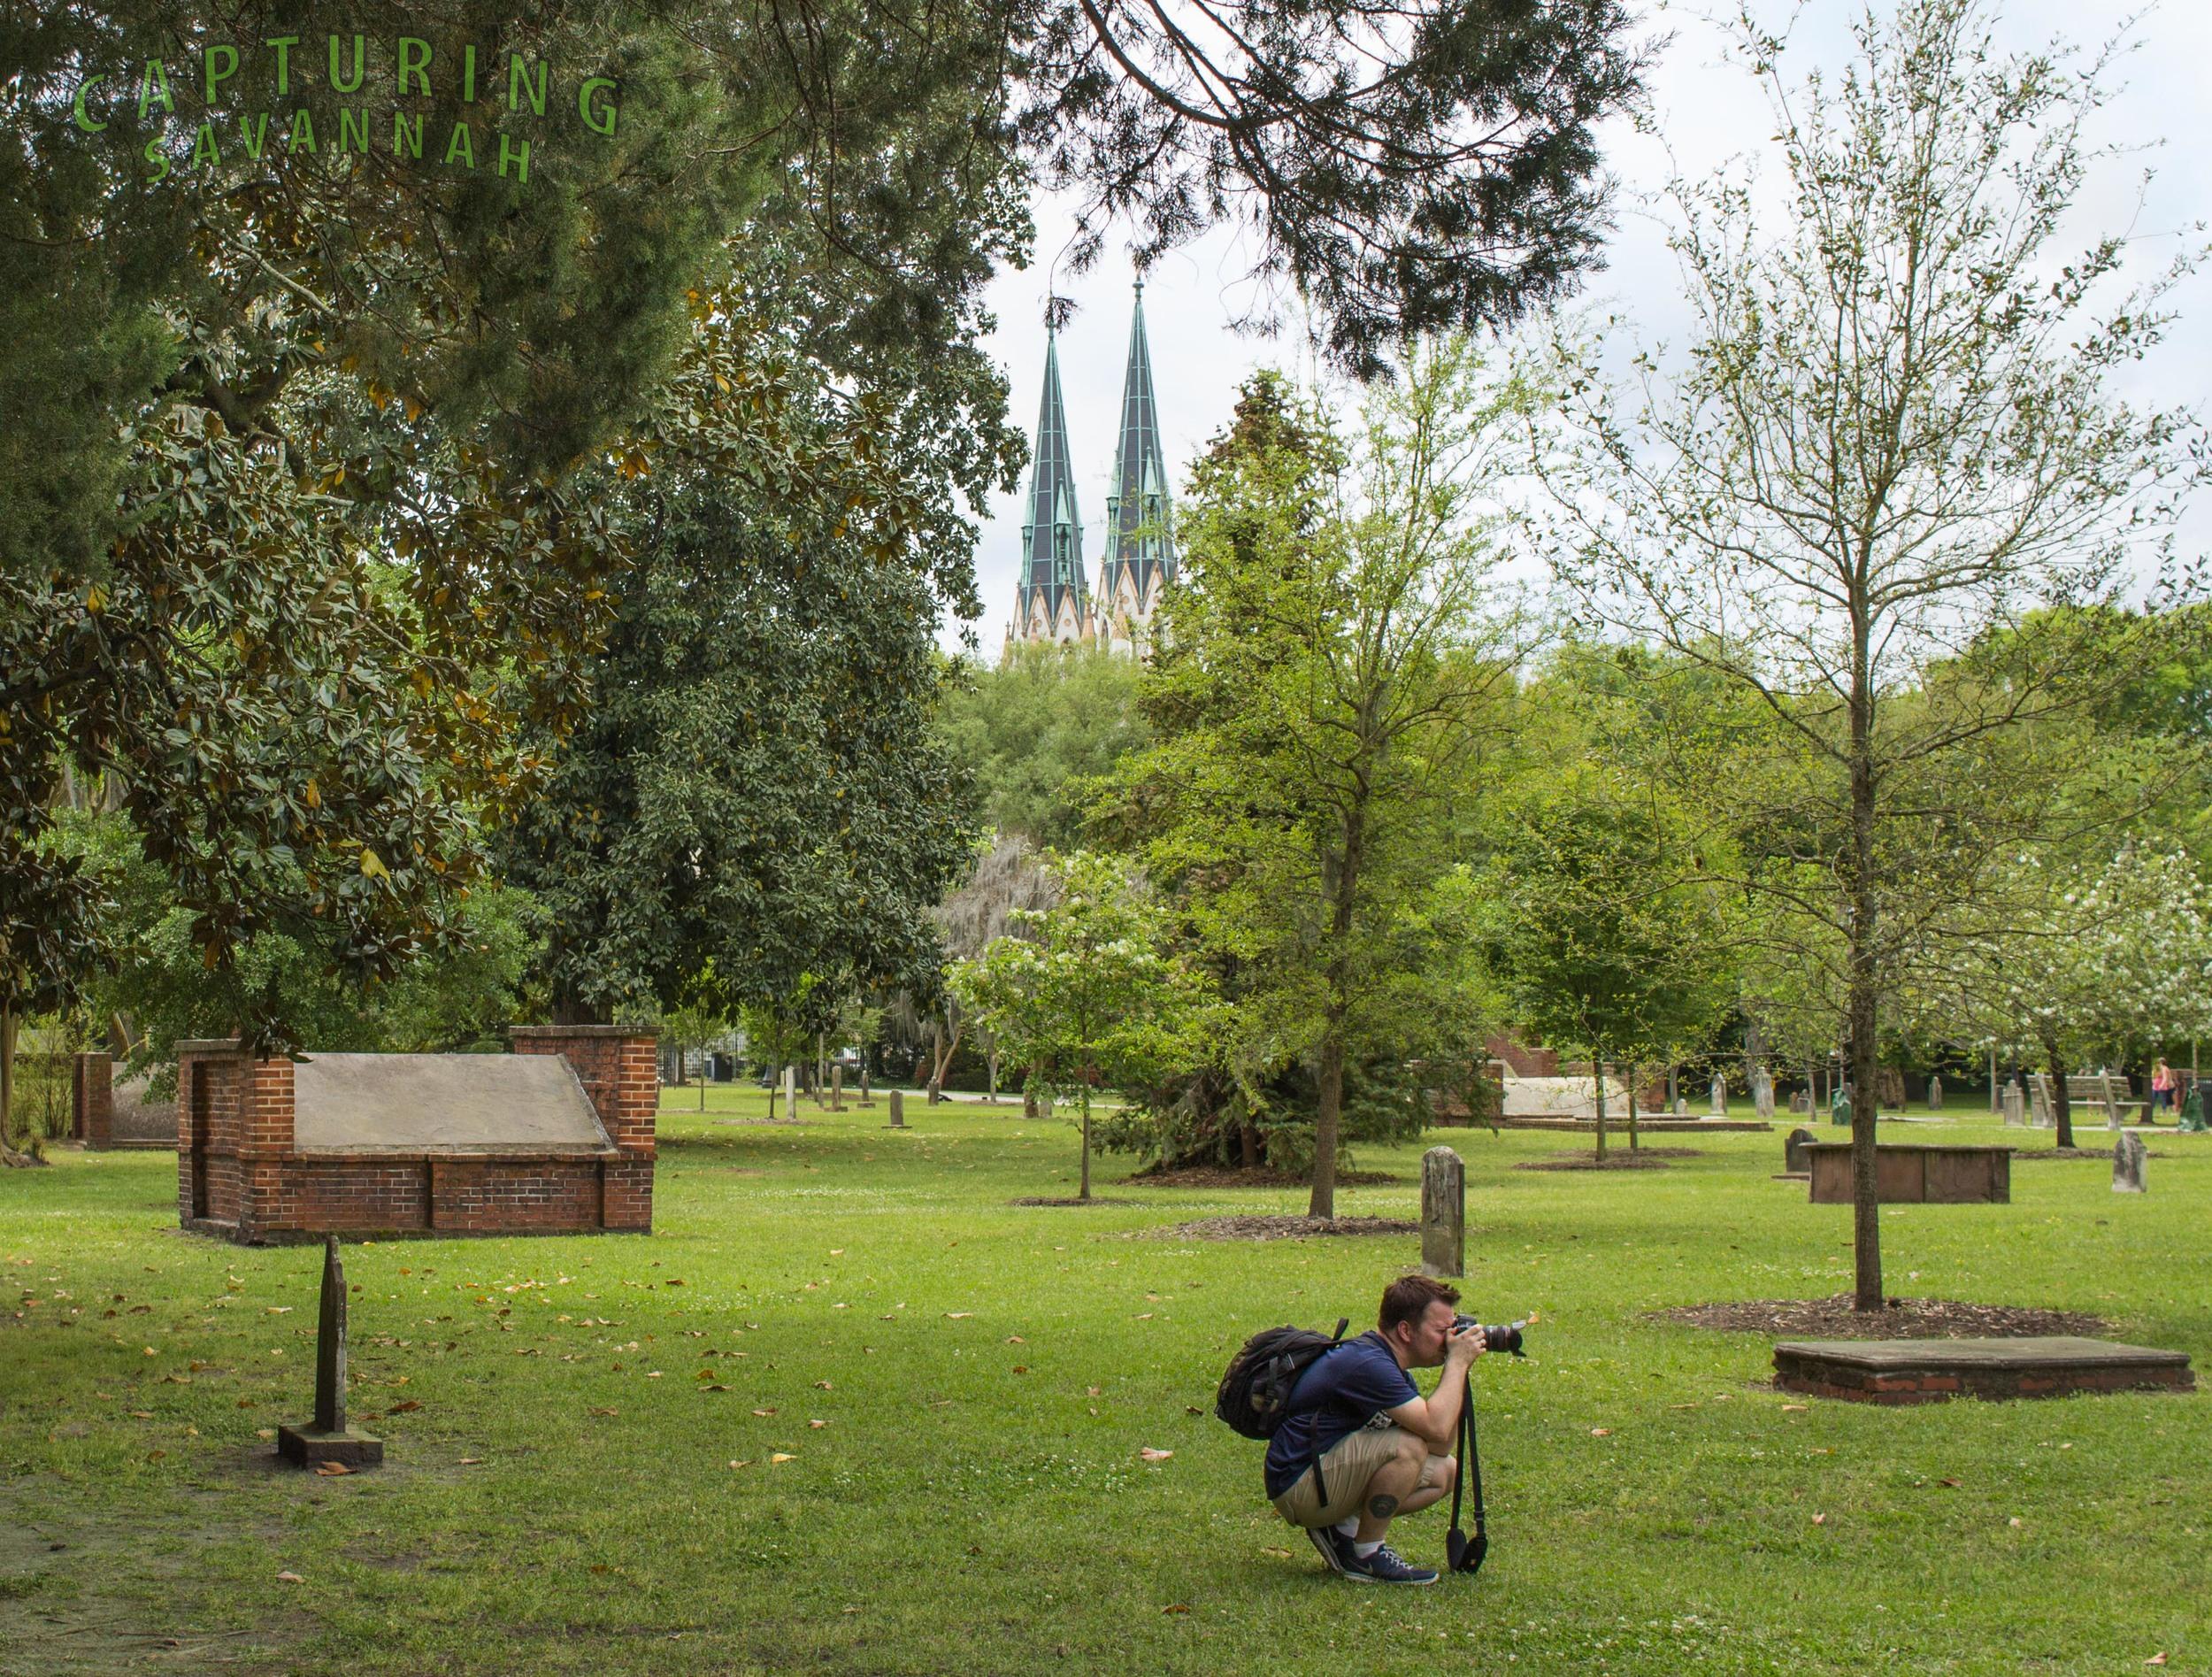 ©2015Capturing-Savannah_Photo-Tour_April-8_Spring_Guests1.jpg